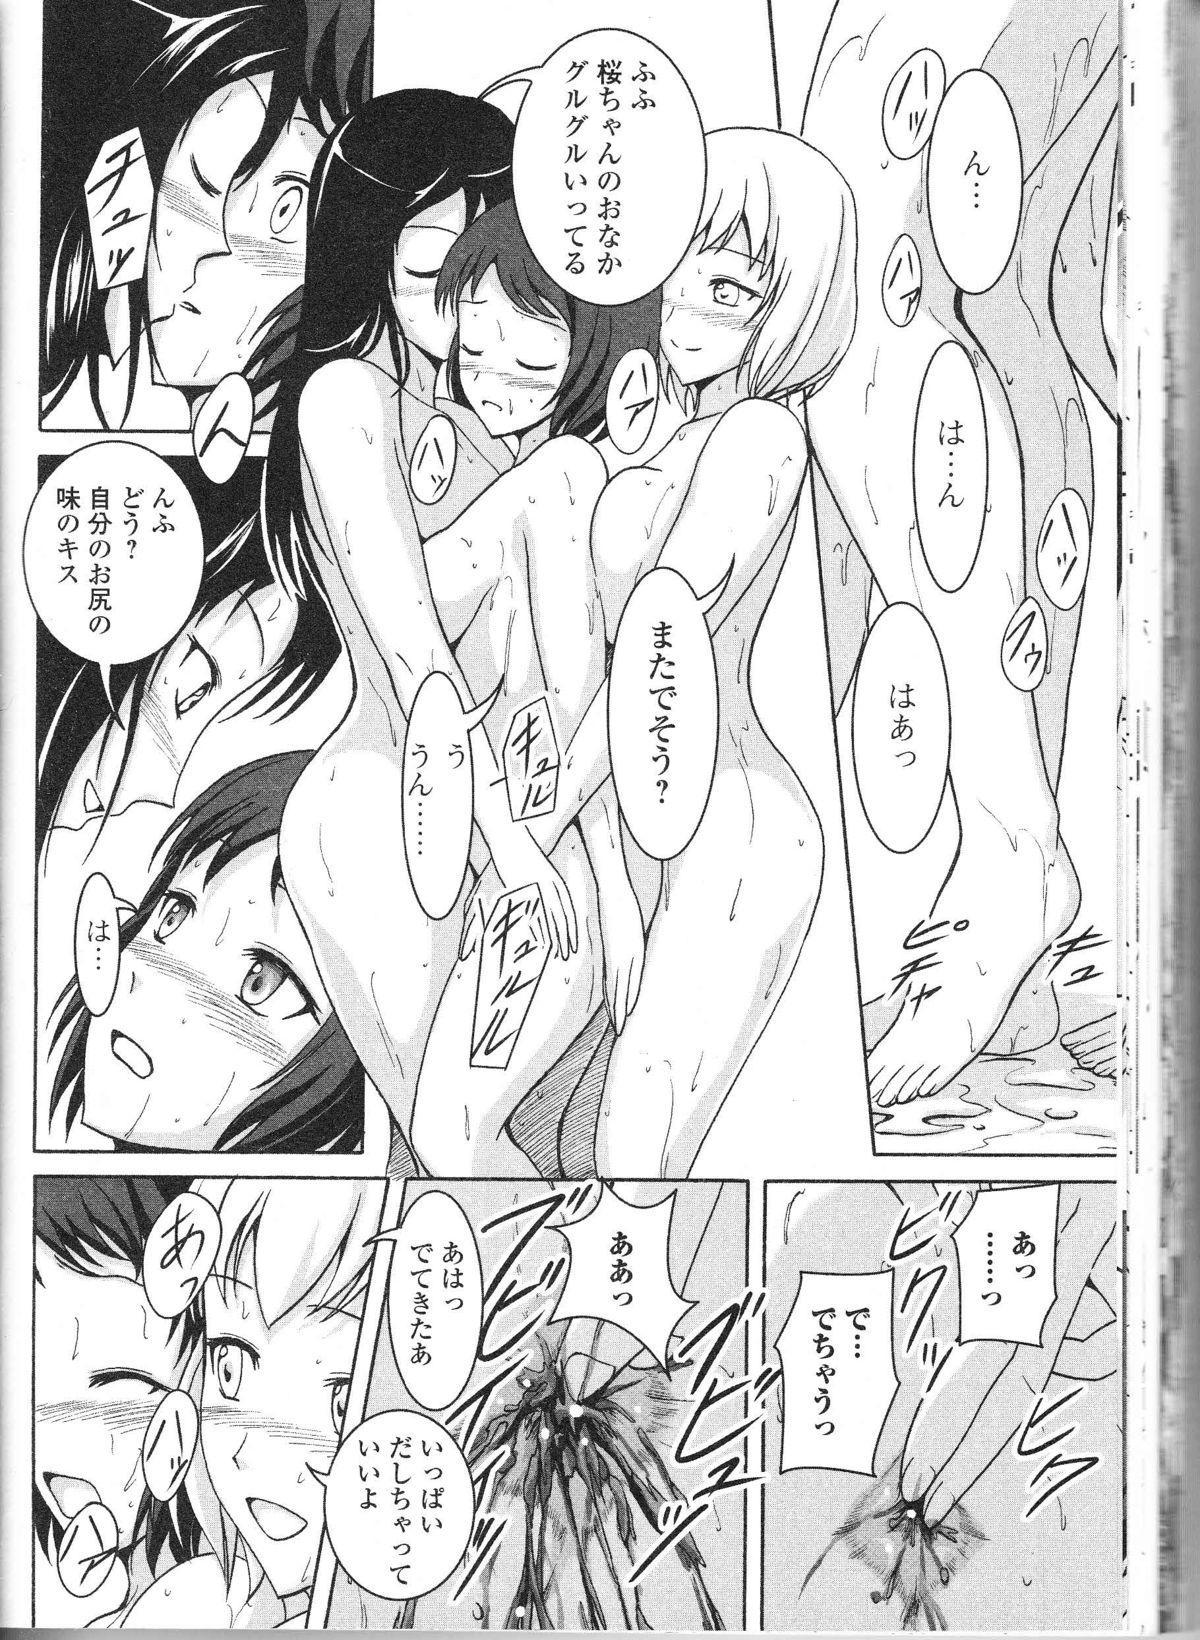 Nozoite wa Ikenai 9 - Do Not Peep! 9 96